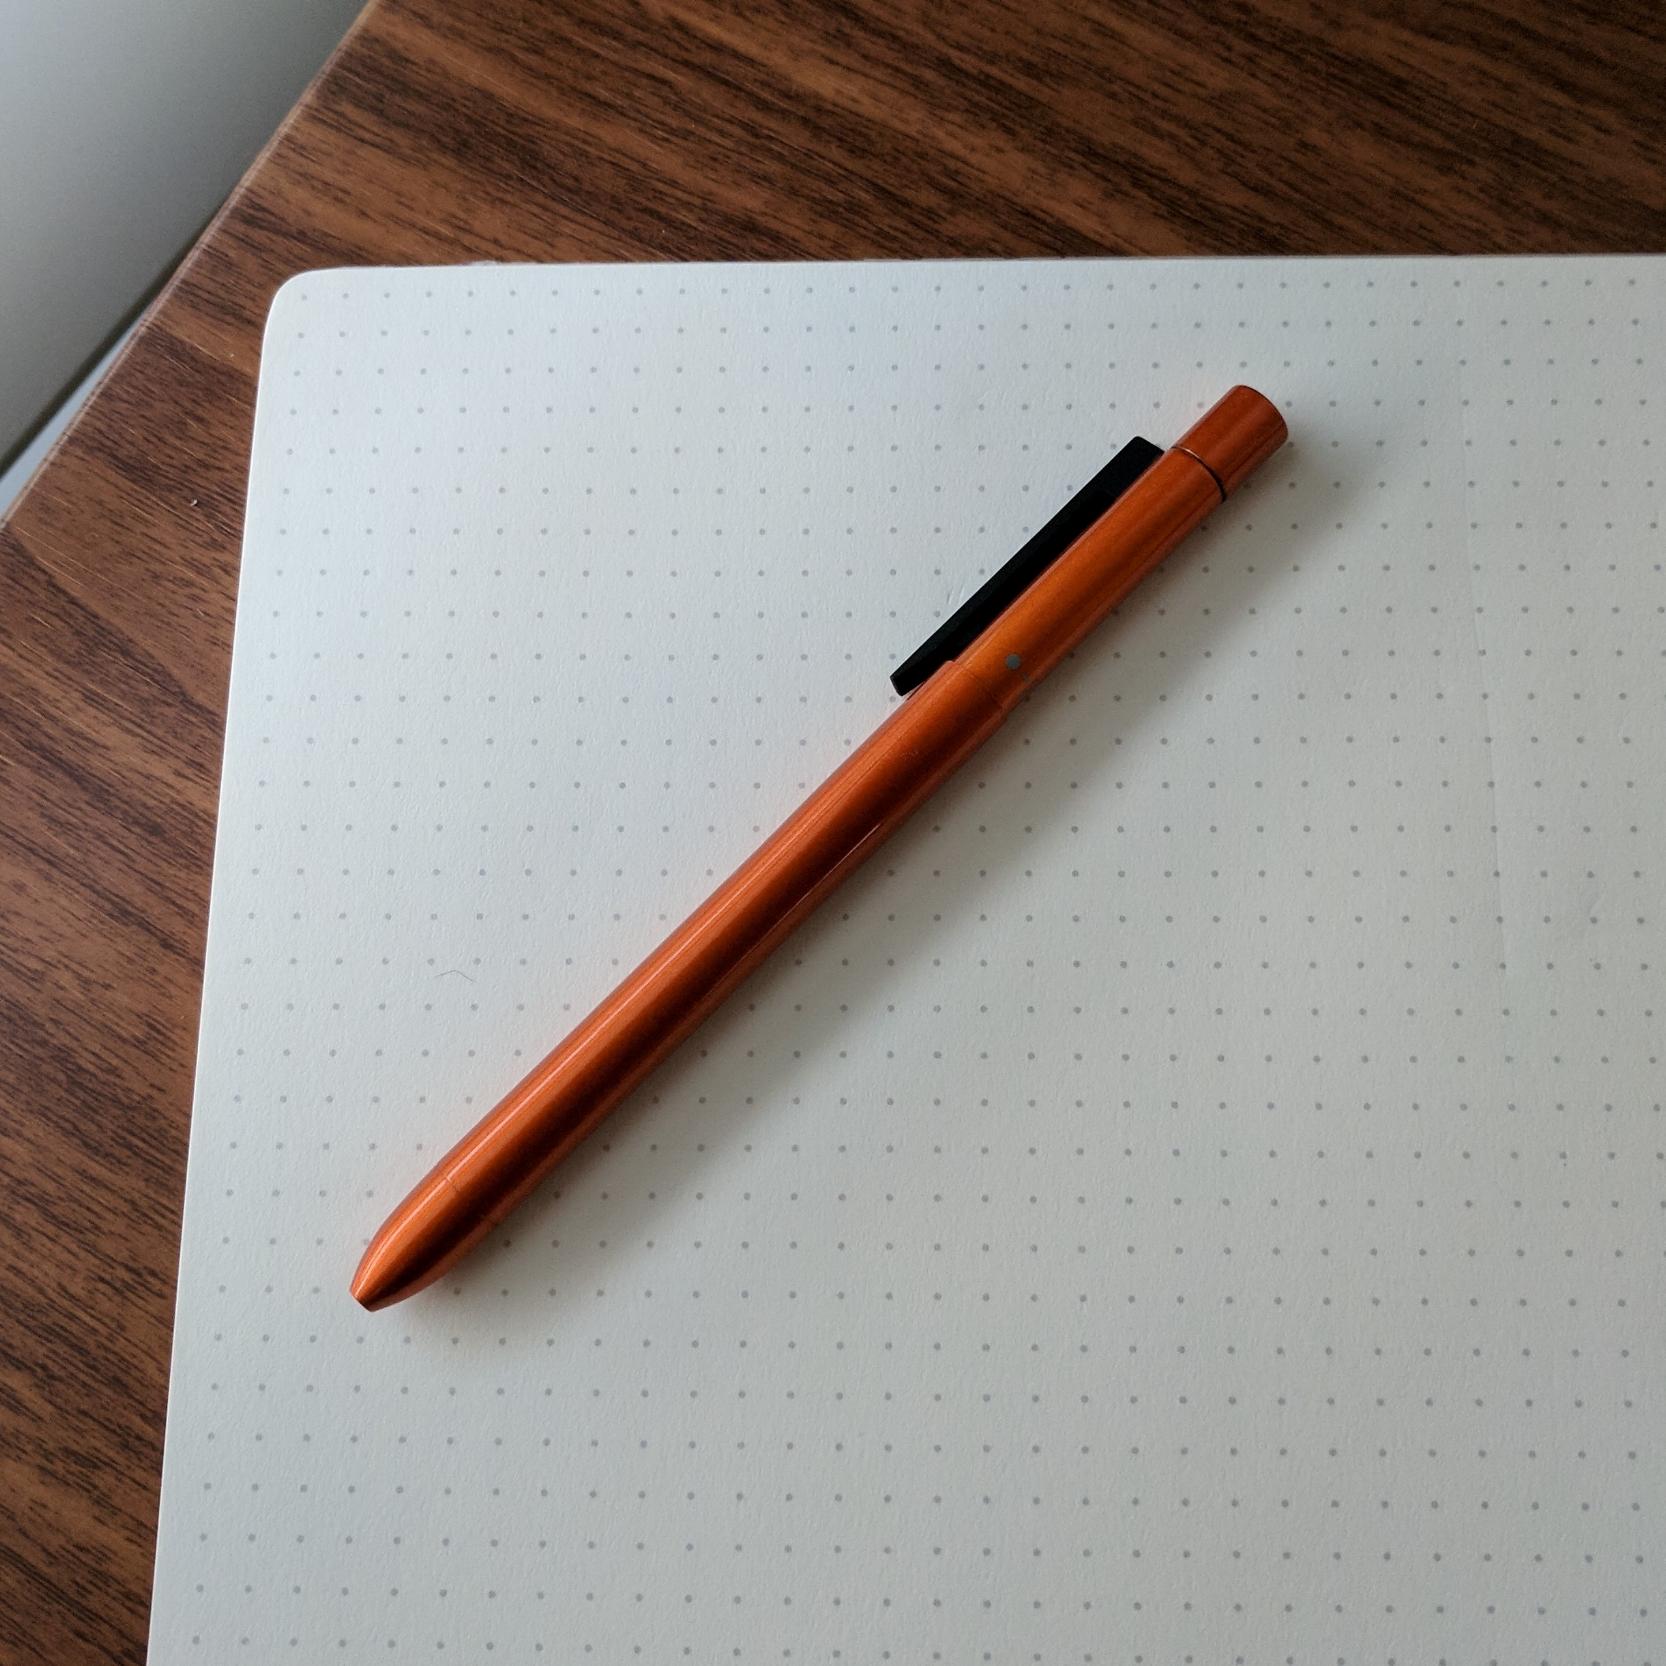 Tombow-Zoom-L104 Multifunction-Pen